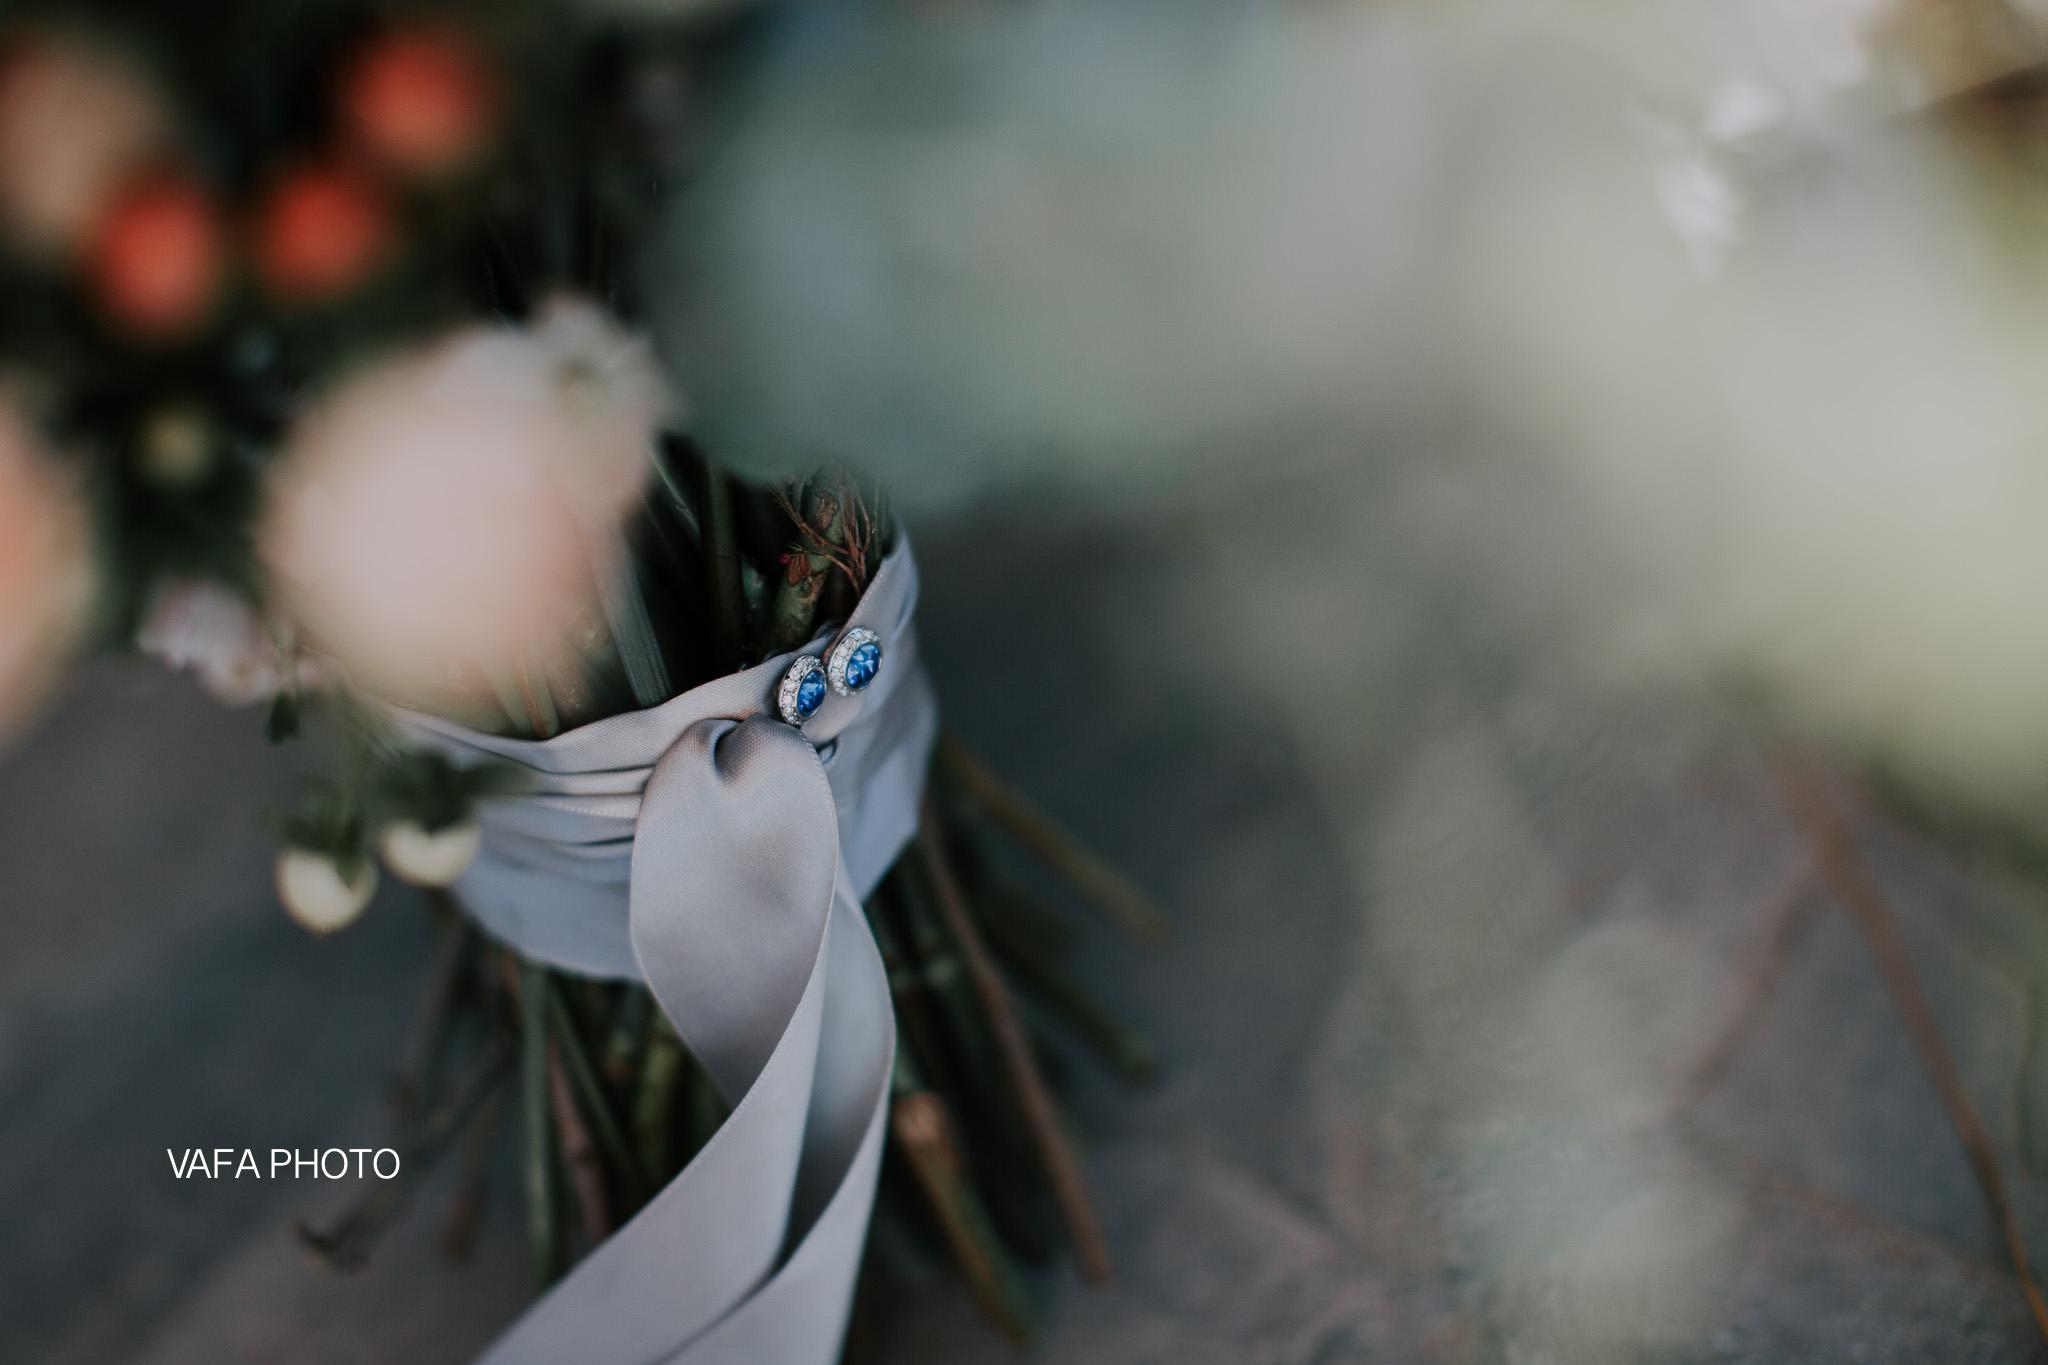 Leo-Carrillo-Ranch-Wedding-Lauren-Mike-Vafa-Photo-804.jpg